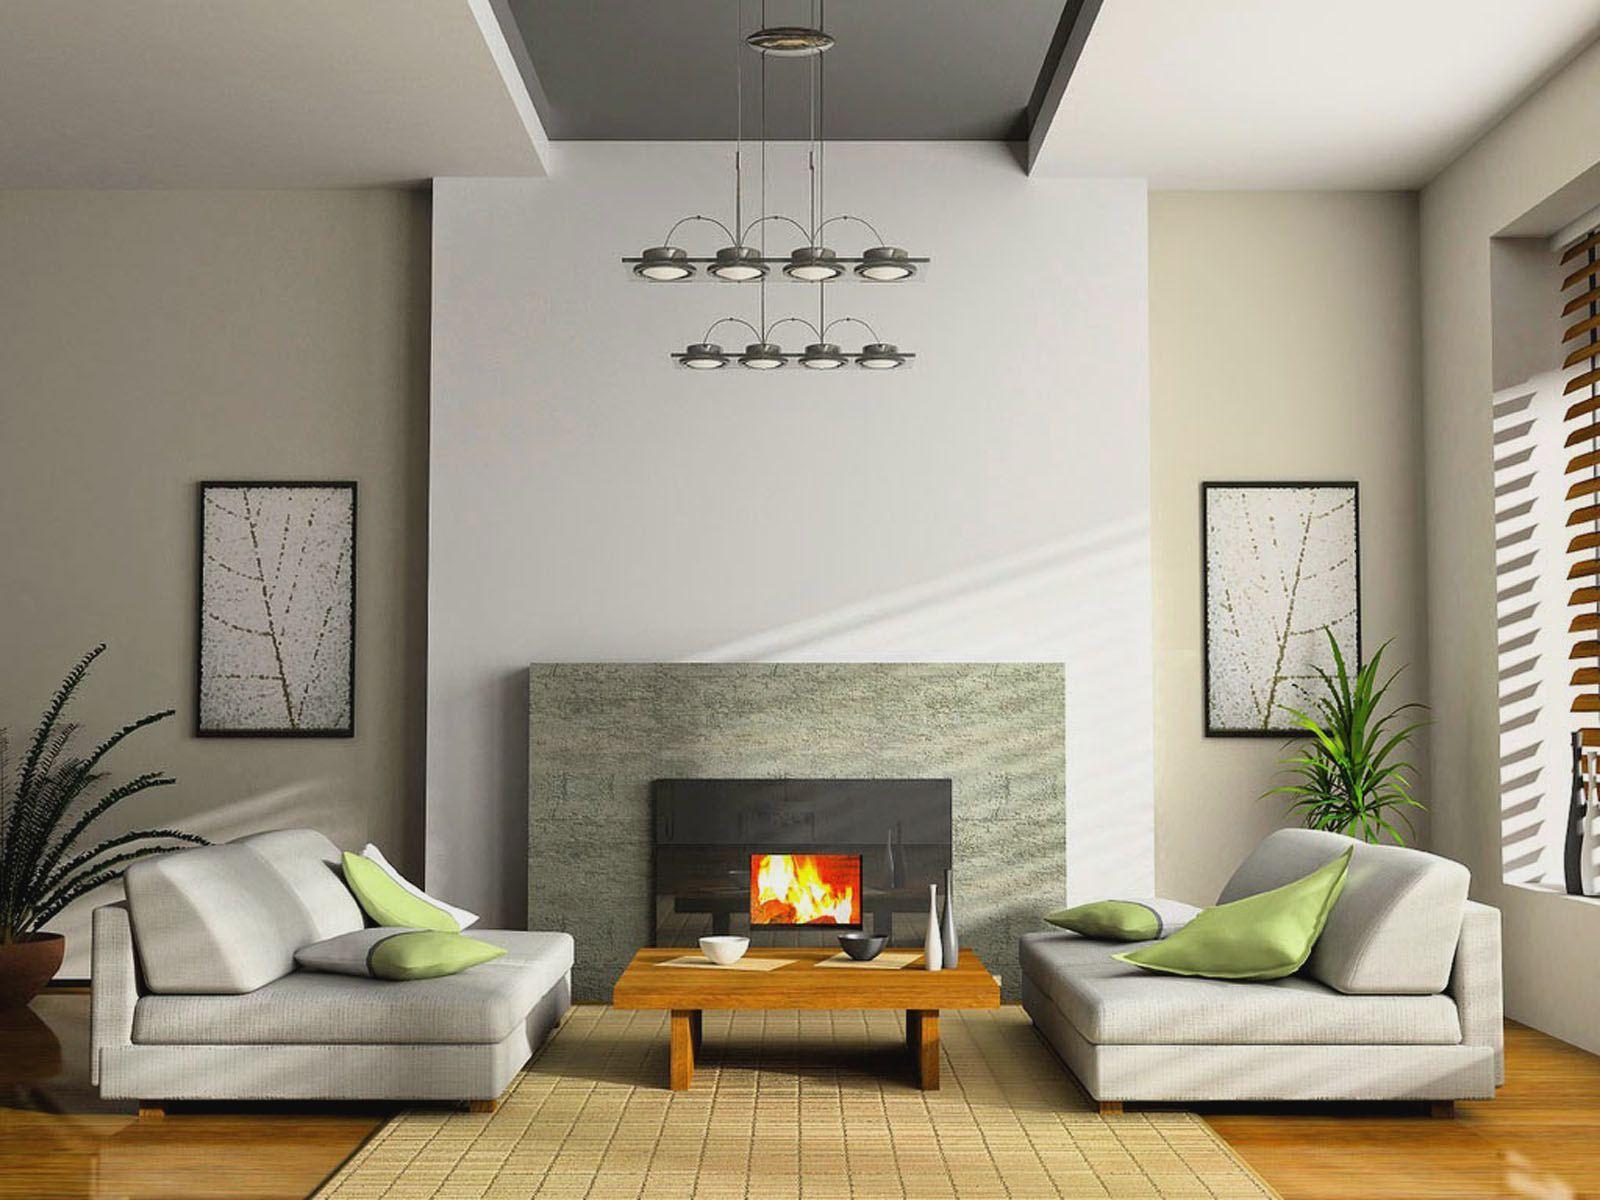 Decorating small room ideas msaessaywriting